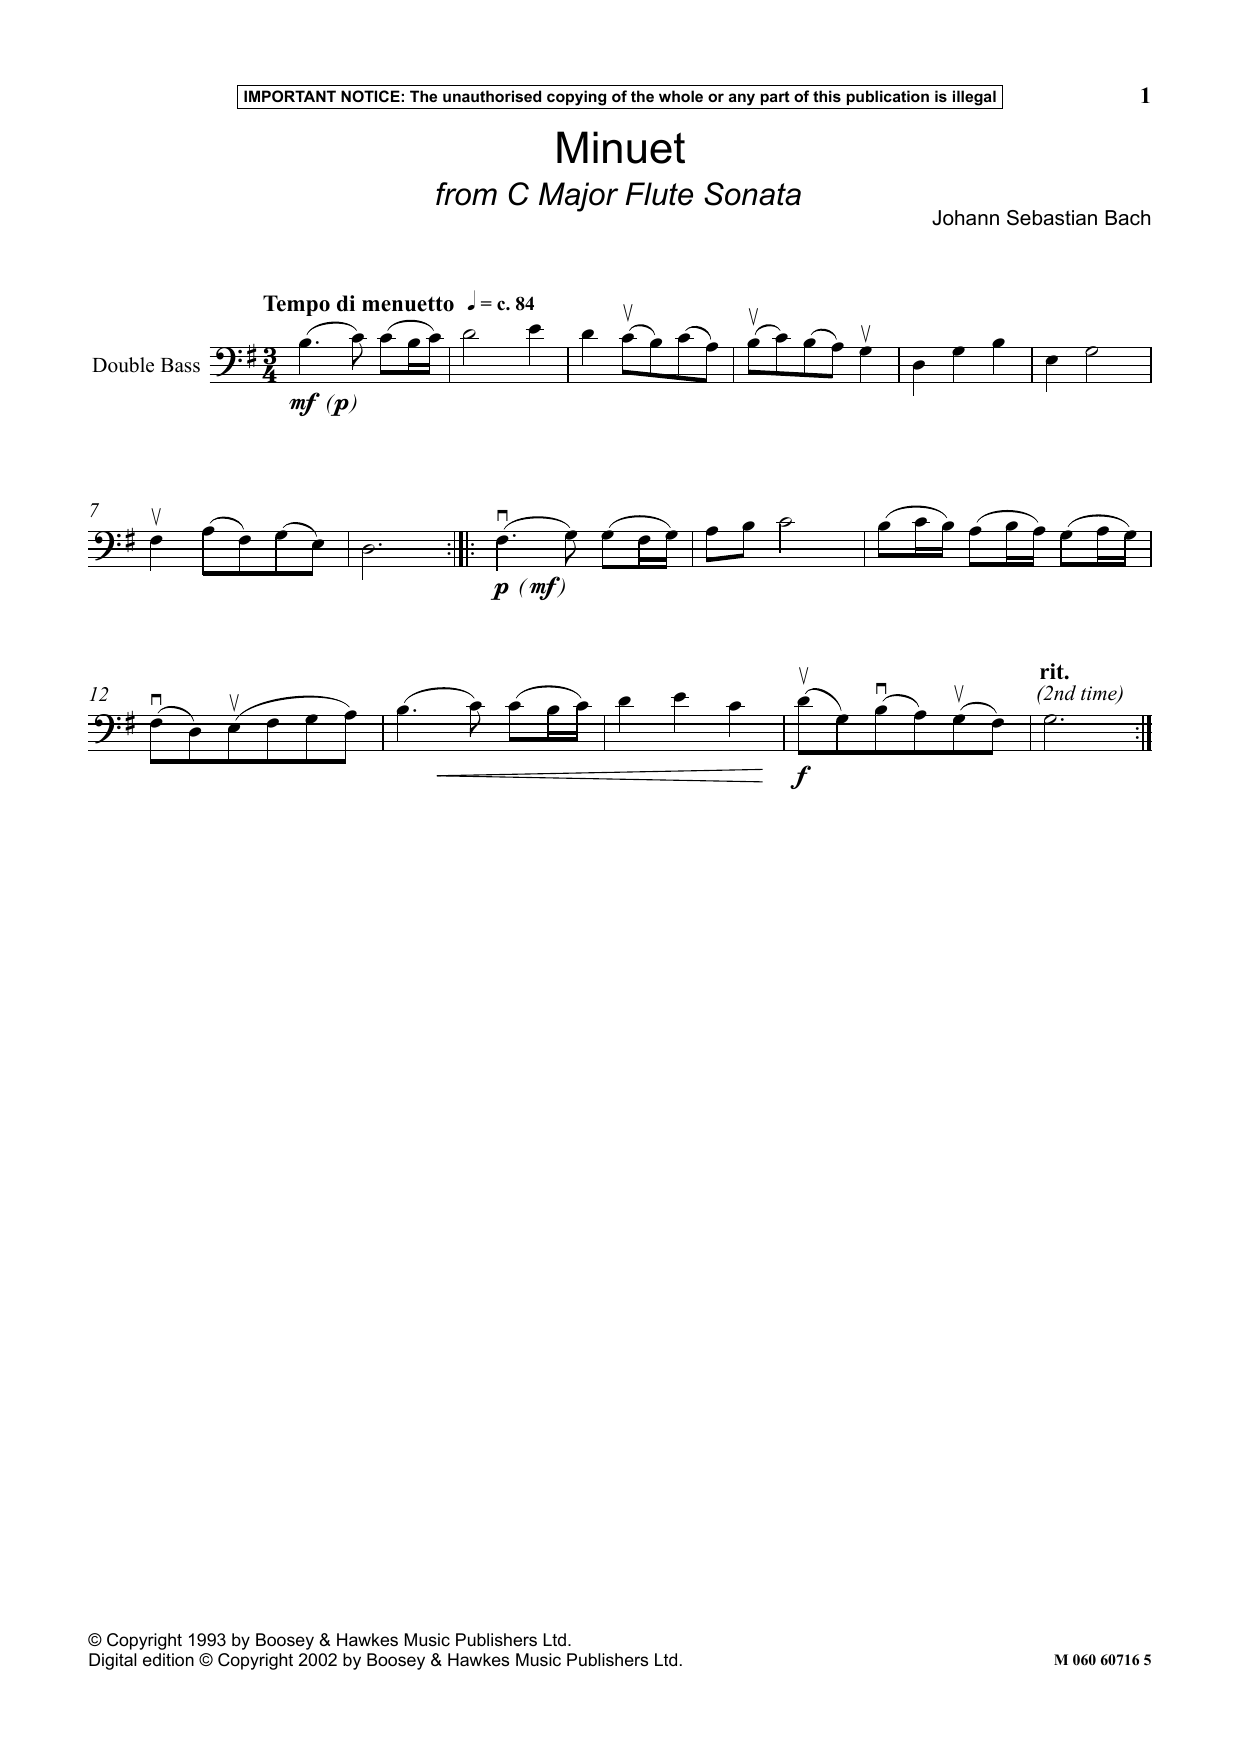 Johann Sebastian Bach Minuet (from C Major Flute Sonata) sheet music notes and chords. Download Printable PDF.